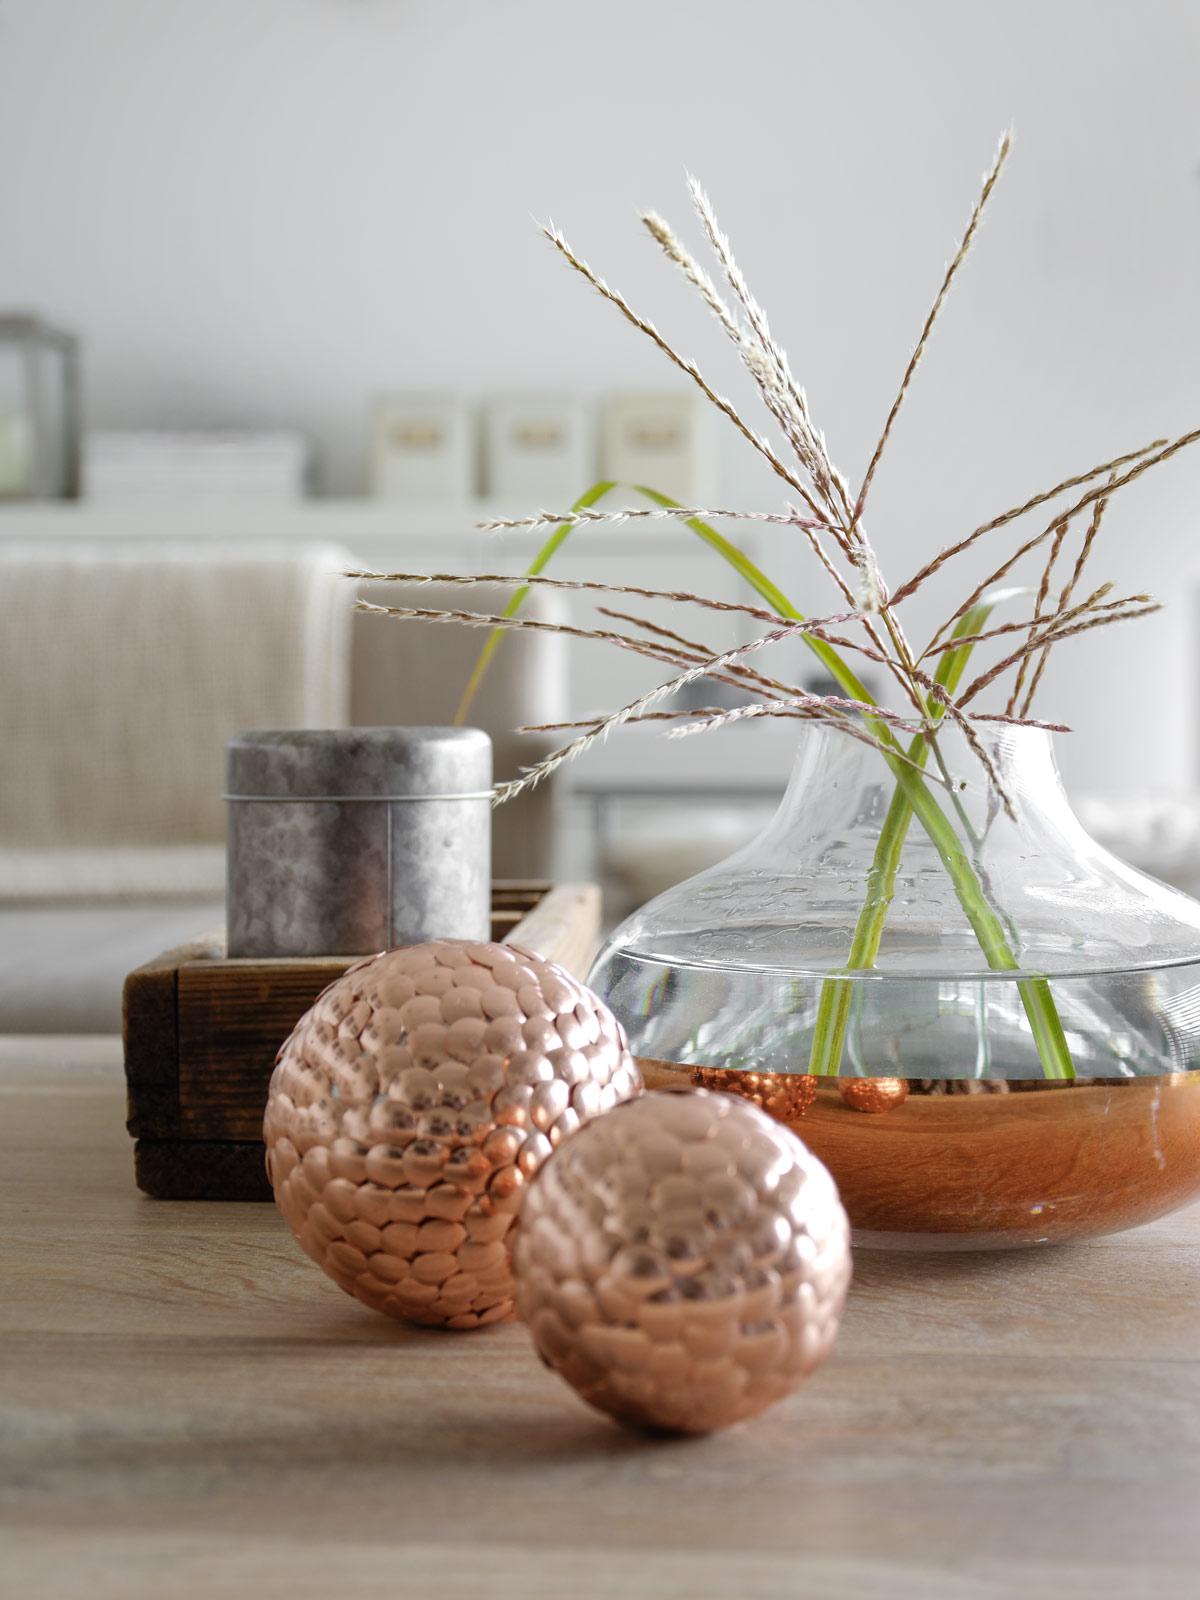 diy dekokugeln aus heftzwecken mxliving. Black Bedroom Furniture Sets. Home Design Ideas